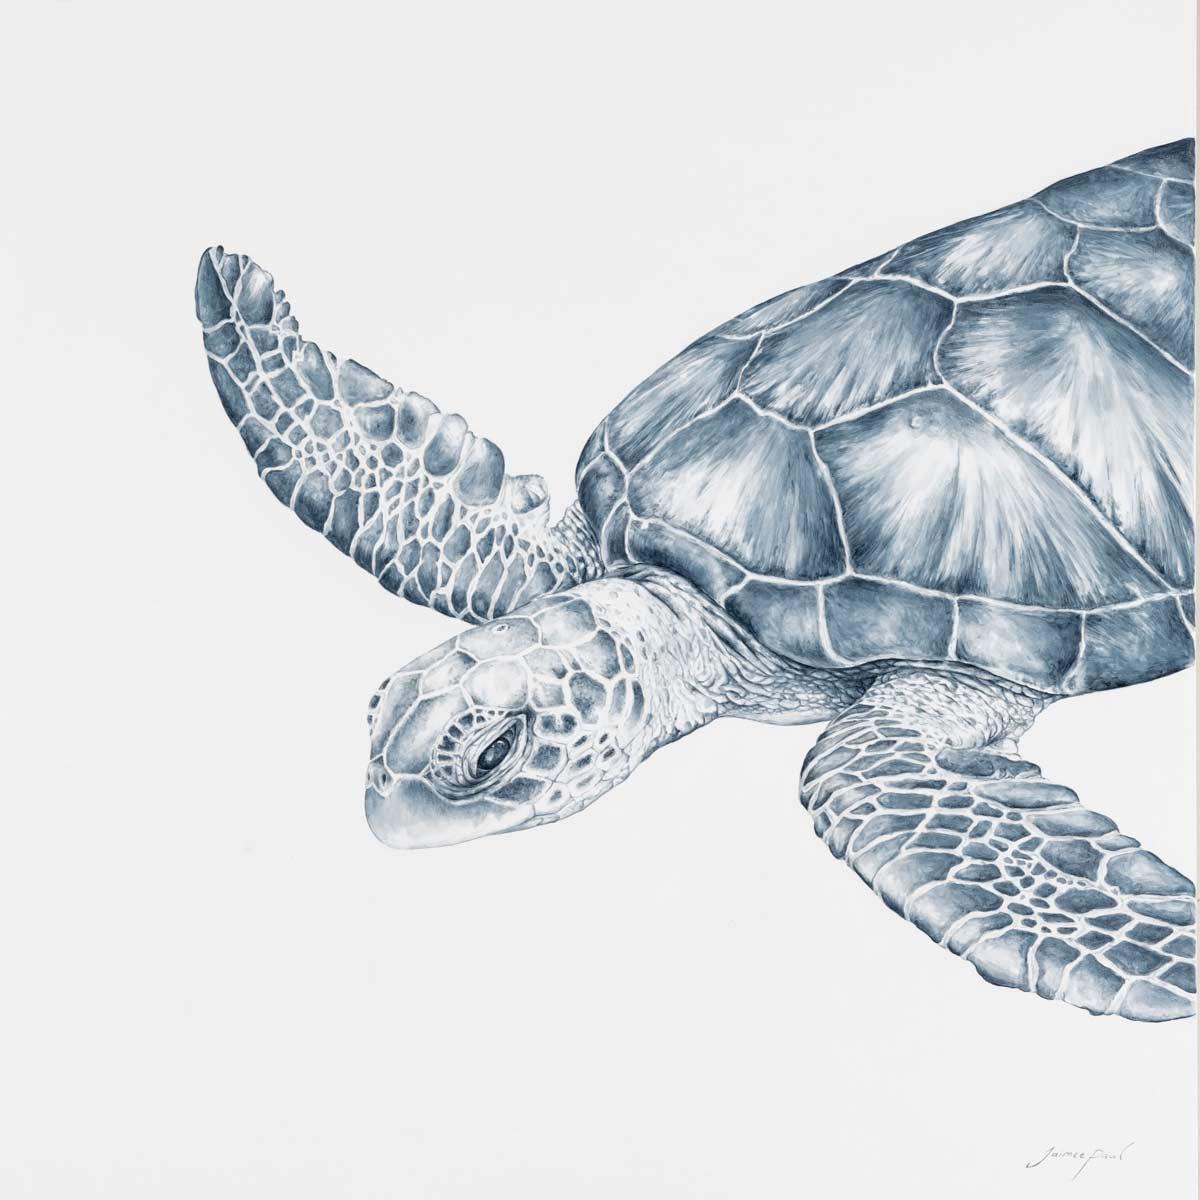 Jaimee-Paul_Ancient-Eyes_93x93_Watercolour-on-canvas_2100_LowRes.jpg